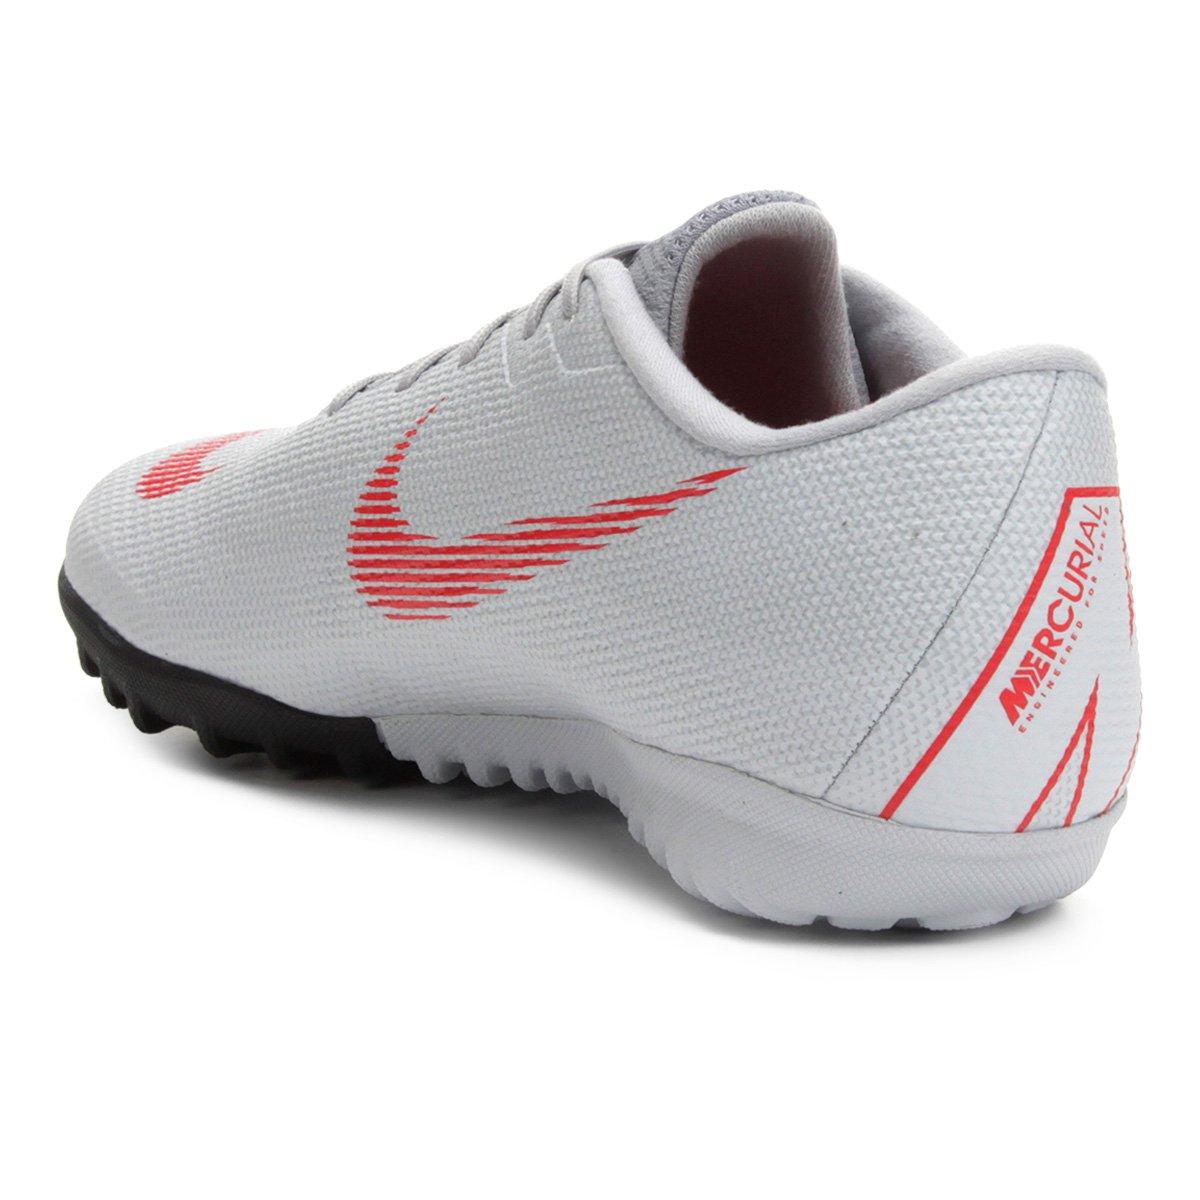 Chuteira Society Nike Mercurial Vapor 12 Academy - Preto e Cinza ... f3dc09b570db0